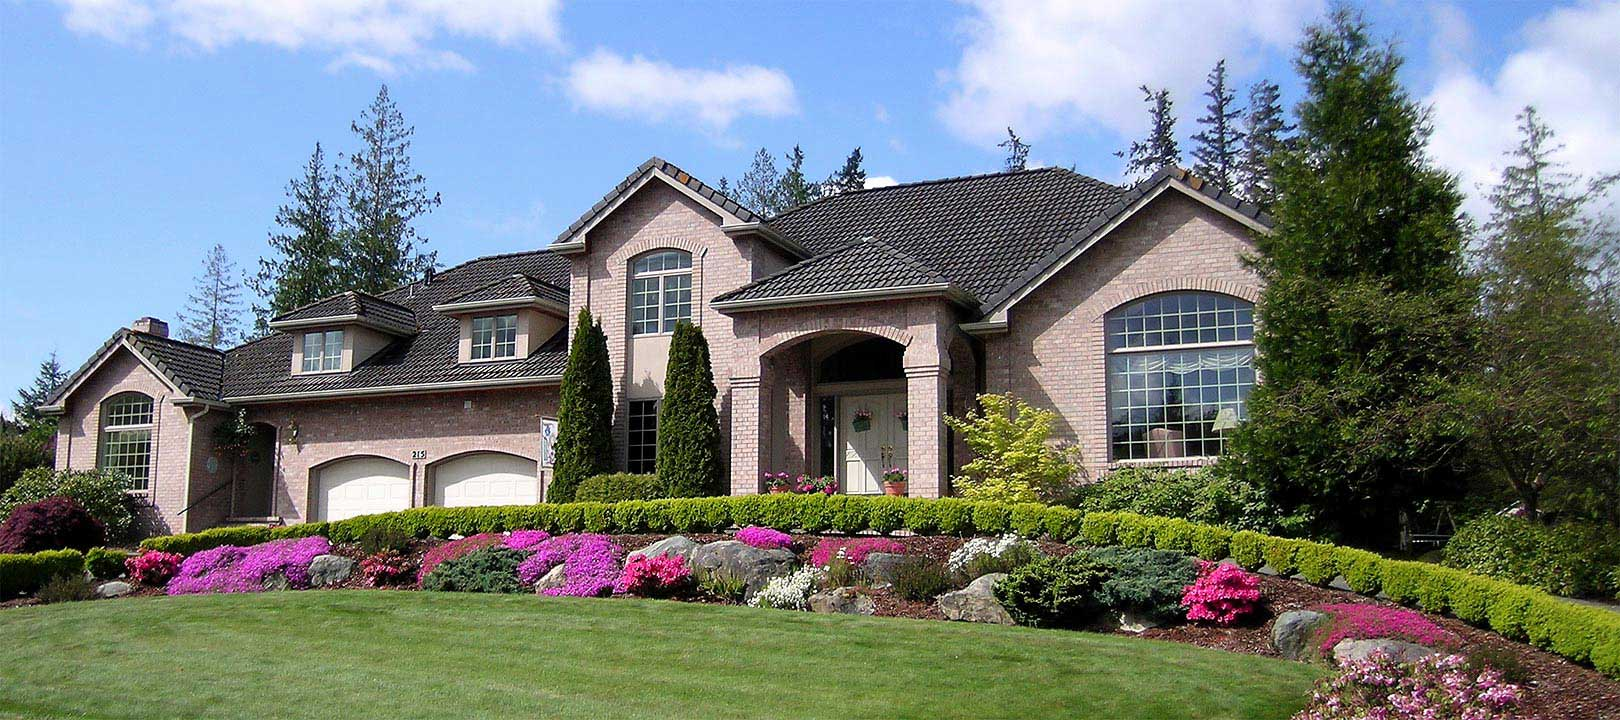 Grand Blanc Property Values